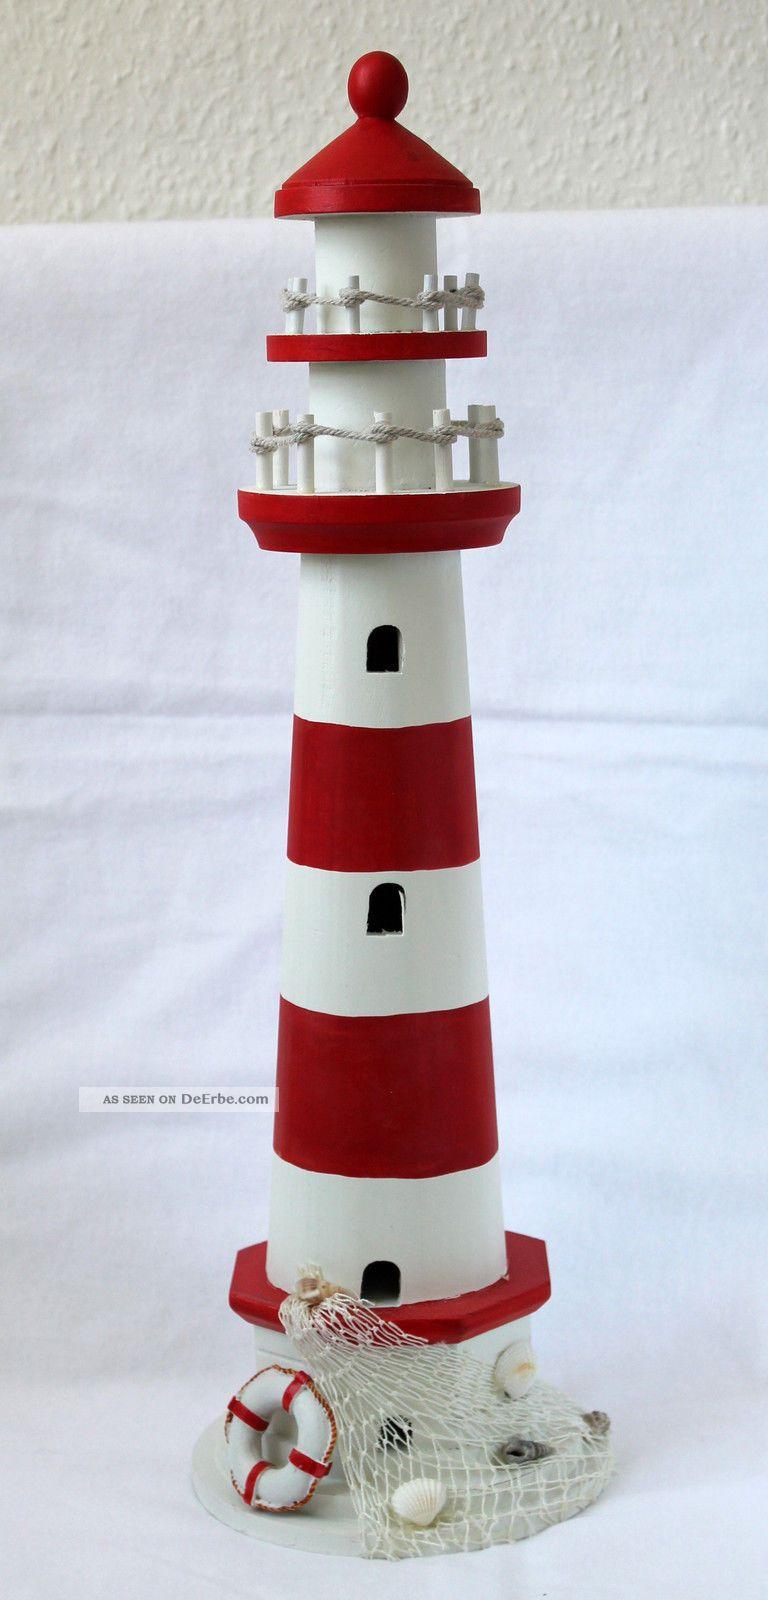 leuchtturm holz 55cm zur dekoration maritim geschm ckt lighthouse. Black Bedroom Furniture Sets. Home Design Ideas